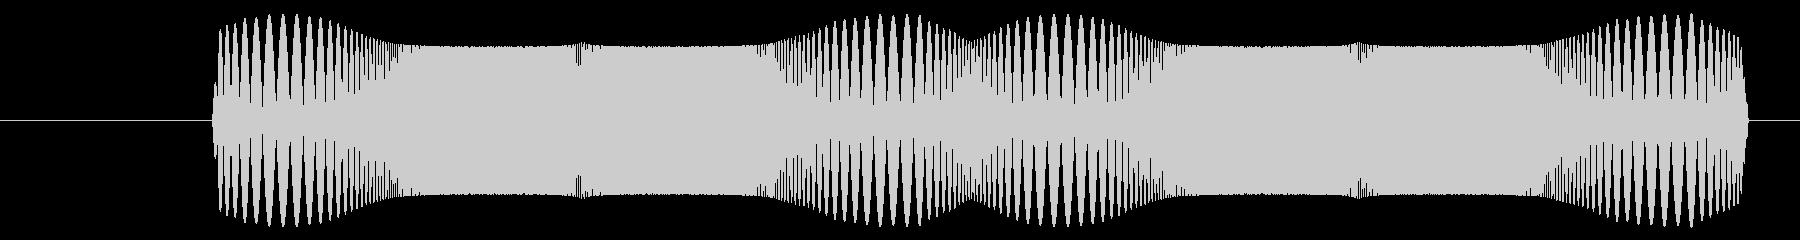 SF/警告音/アラーム/の未再生の波形